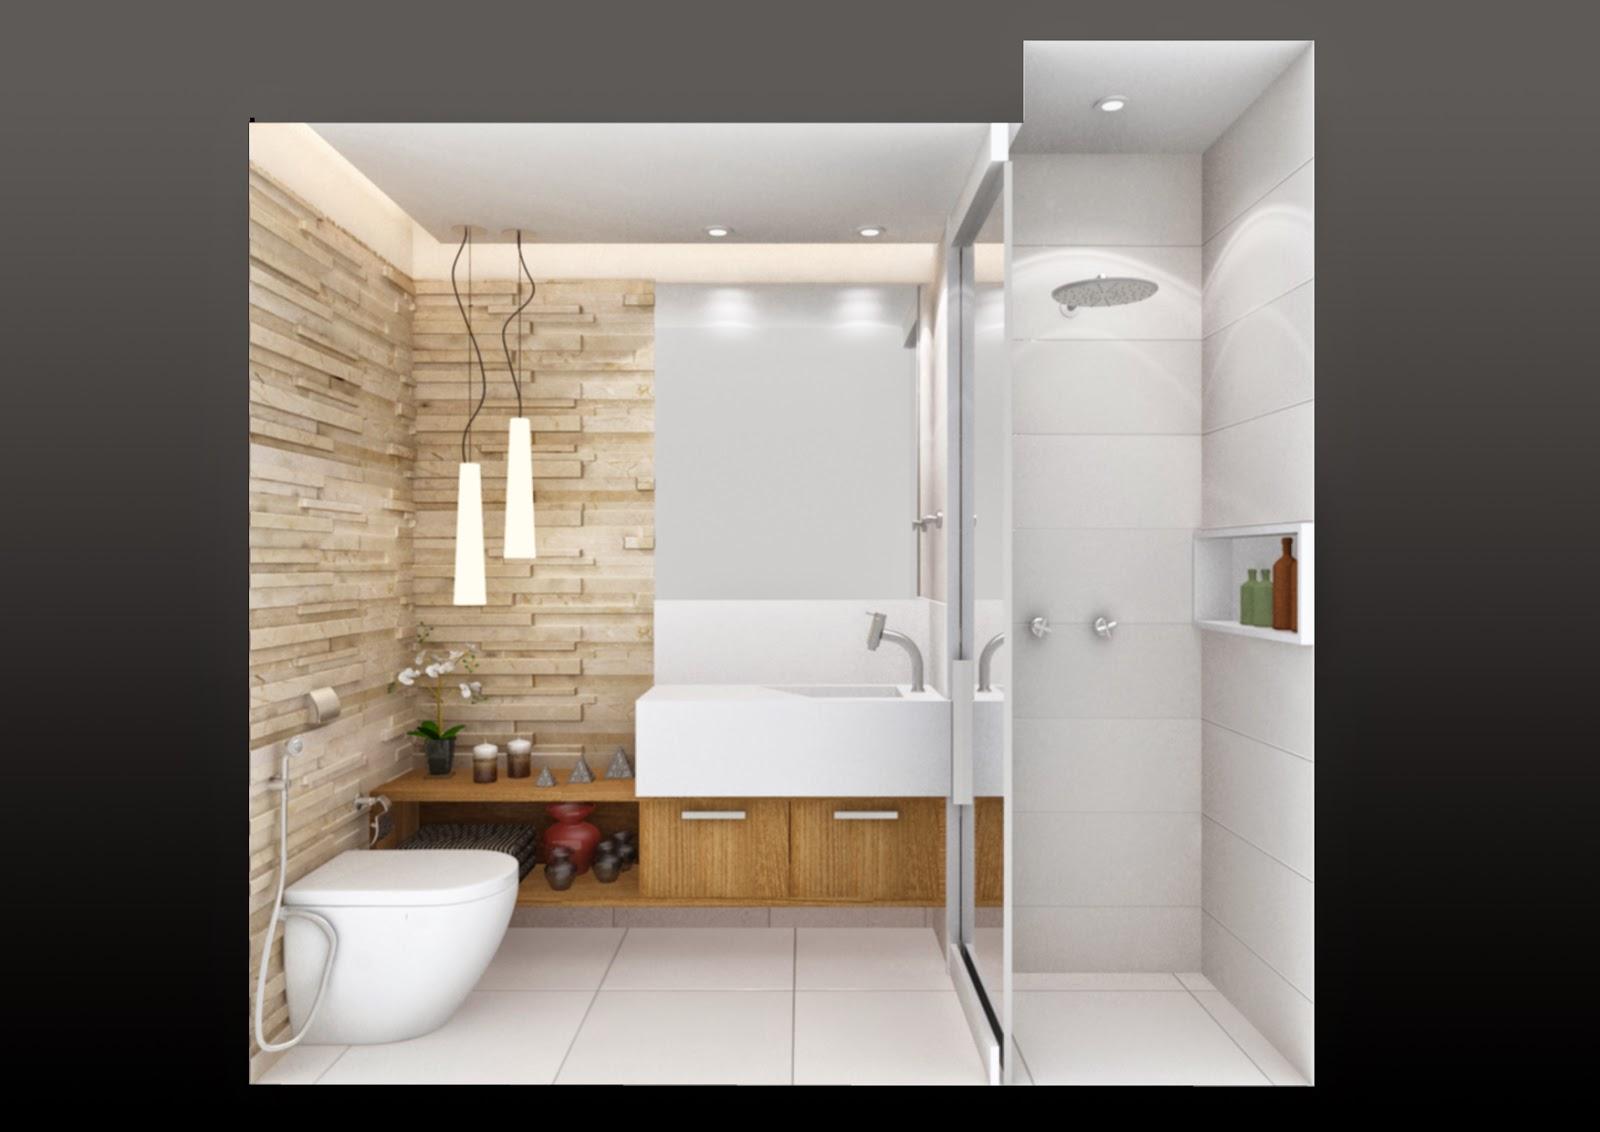 Ambientando: LAVABO X BANHEIRO SOCIAL #8C693F 1600x1132 Arquitetura Banheiro Social